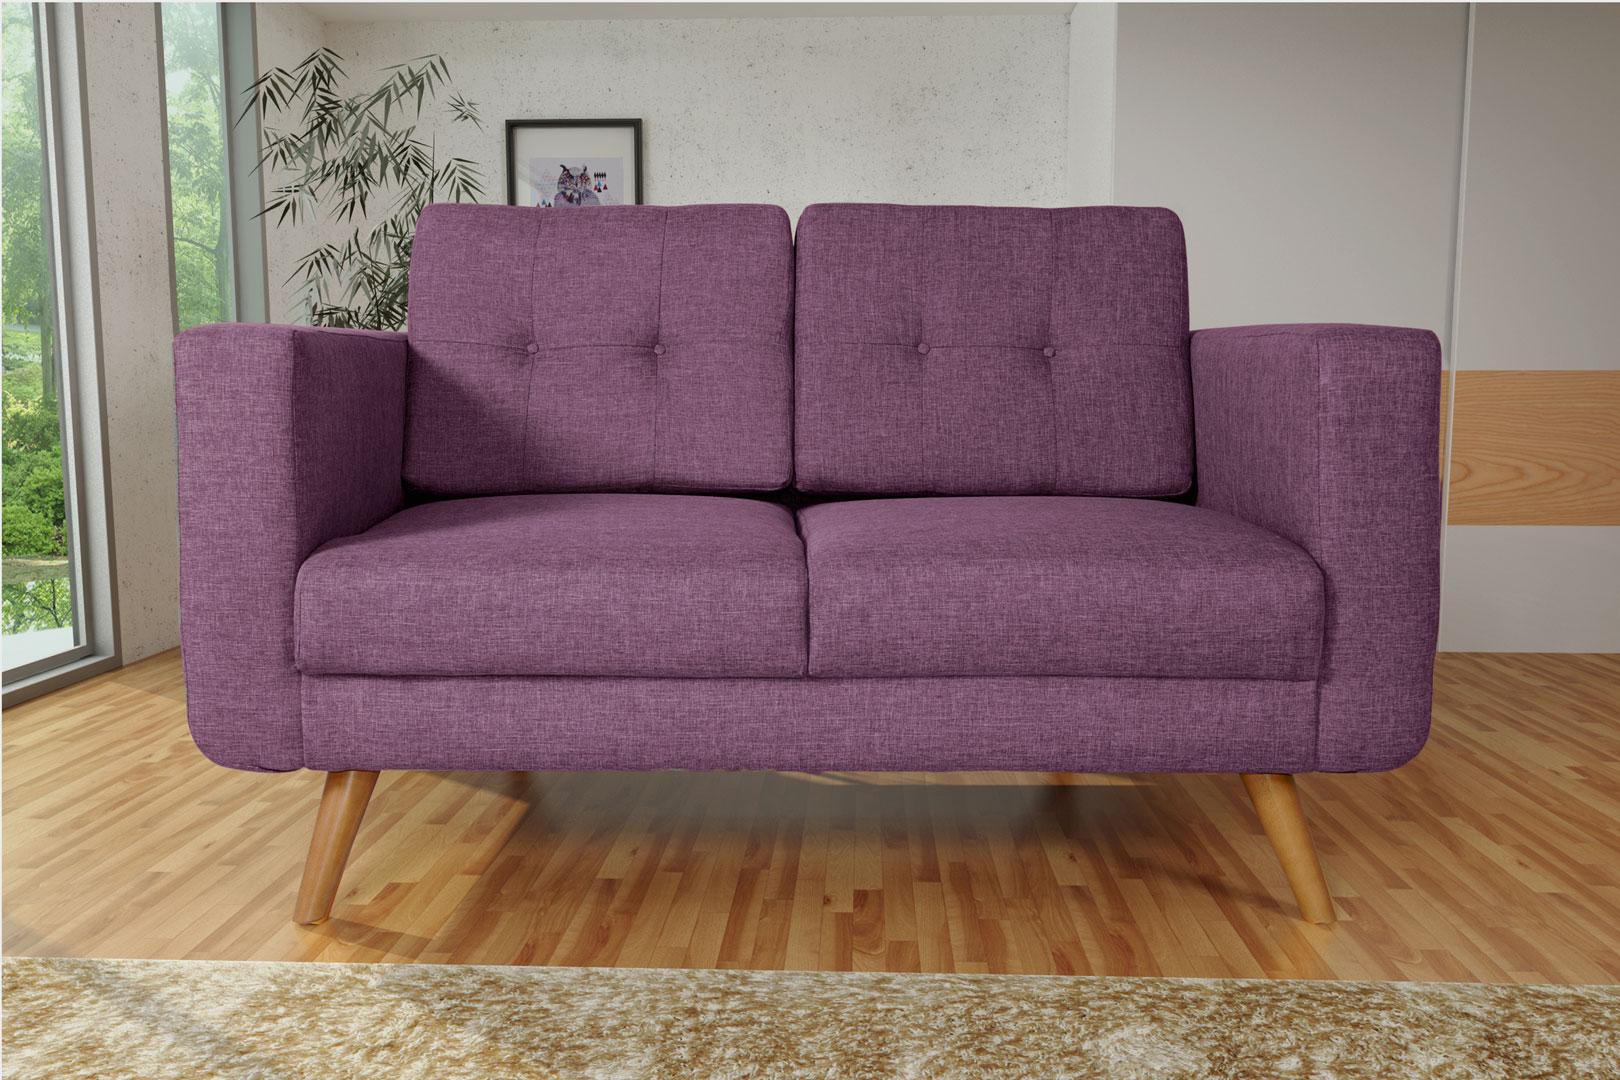 Canapé fixe 2 places contemporain en tissu prune Tebessa